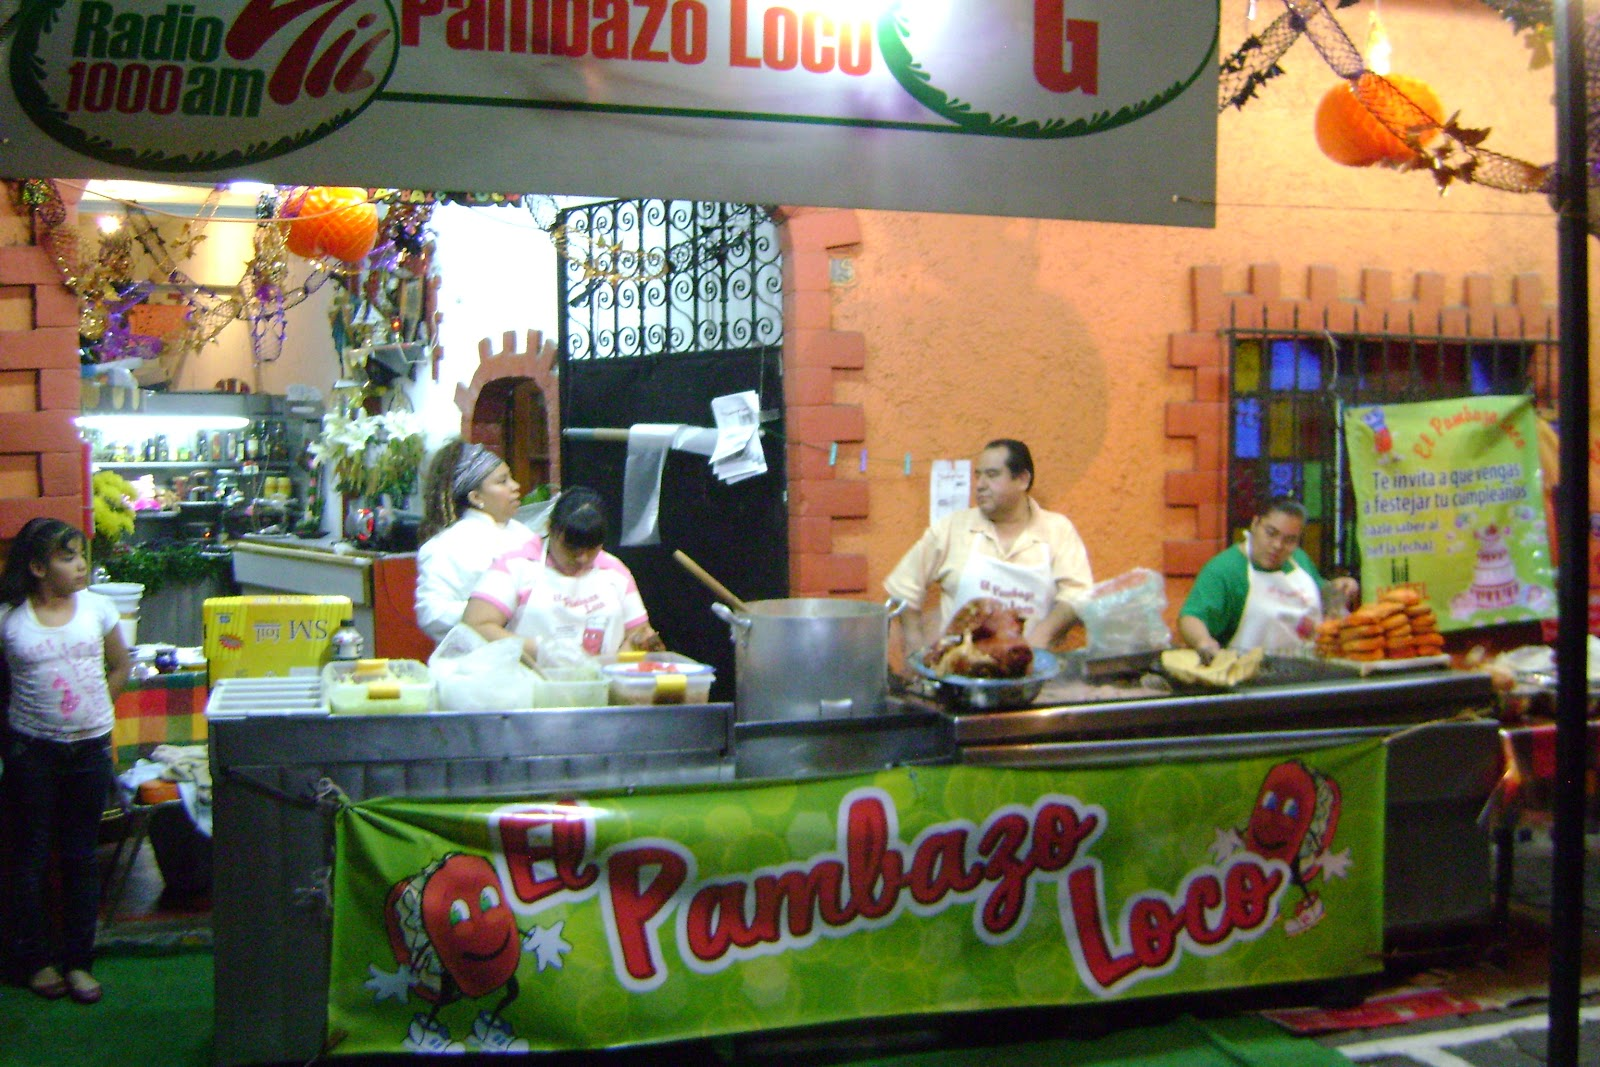 Pambazo Loco